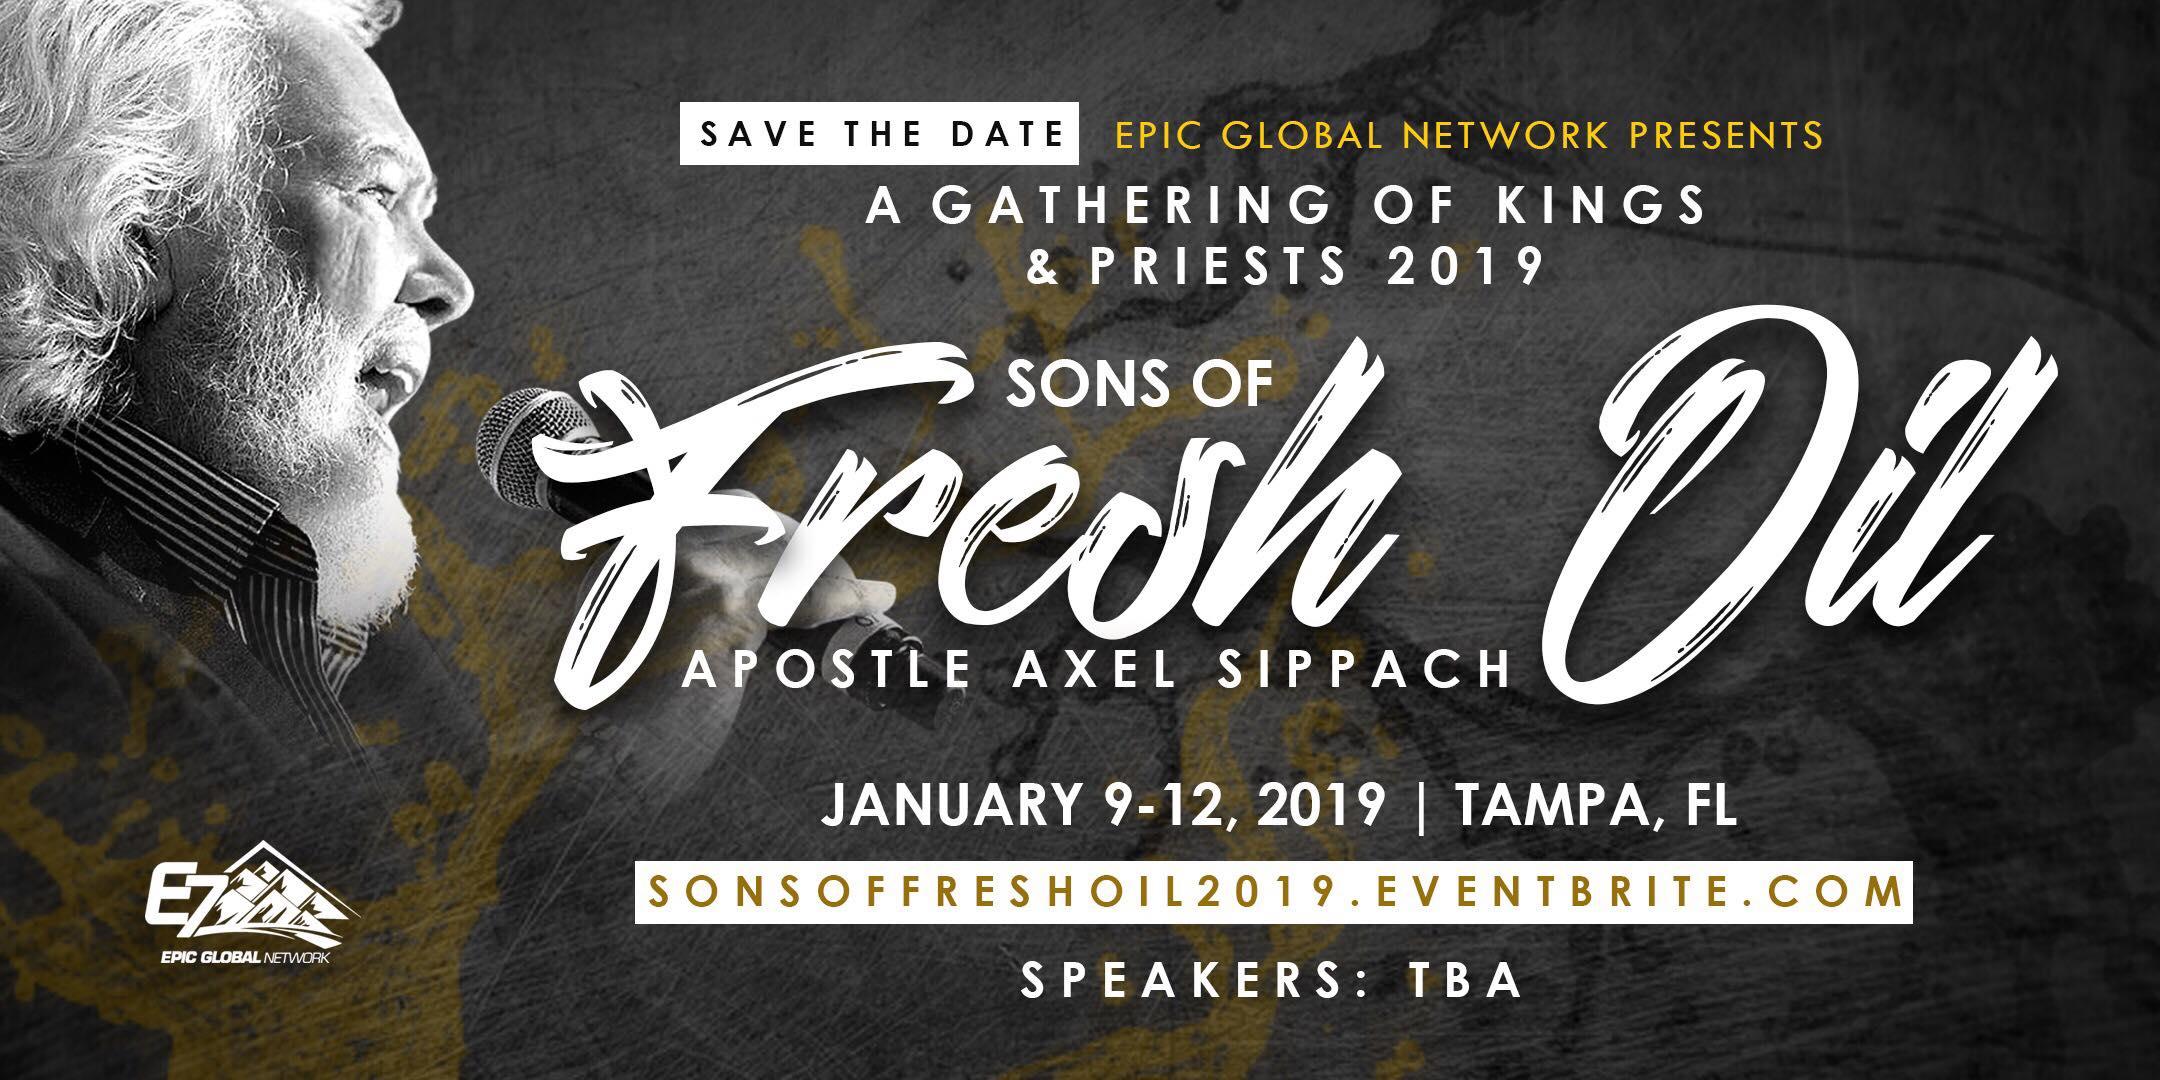 sons-of-fresh-oil-2019-eventbrite-flyer